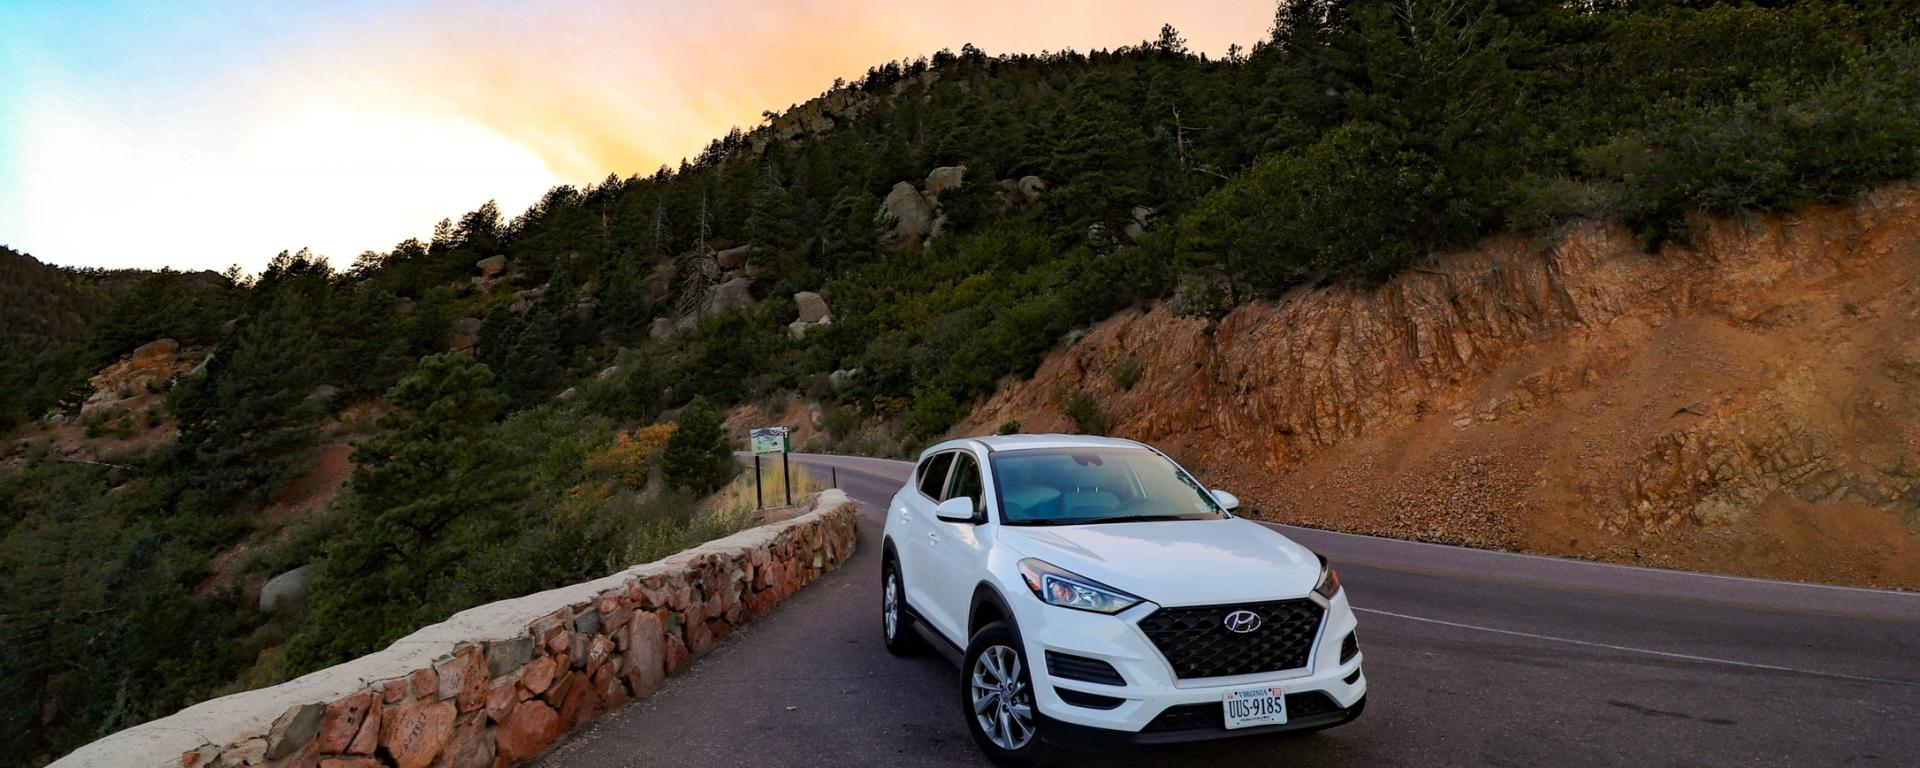 Hyundai Tucson at Pikes Peak